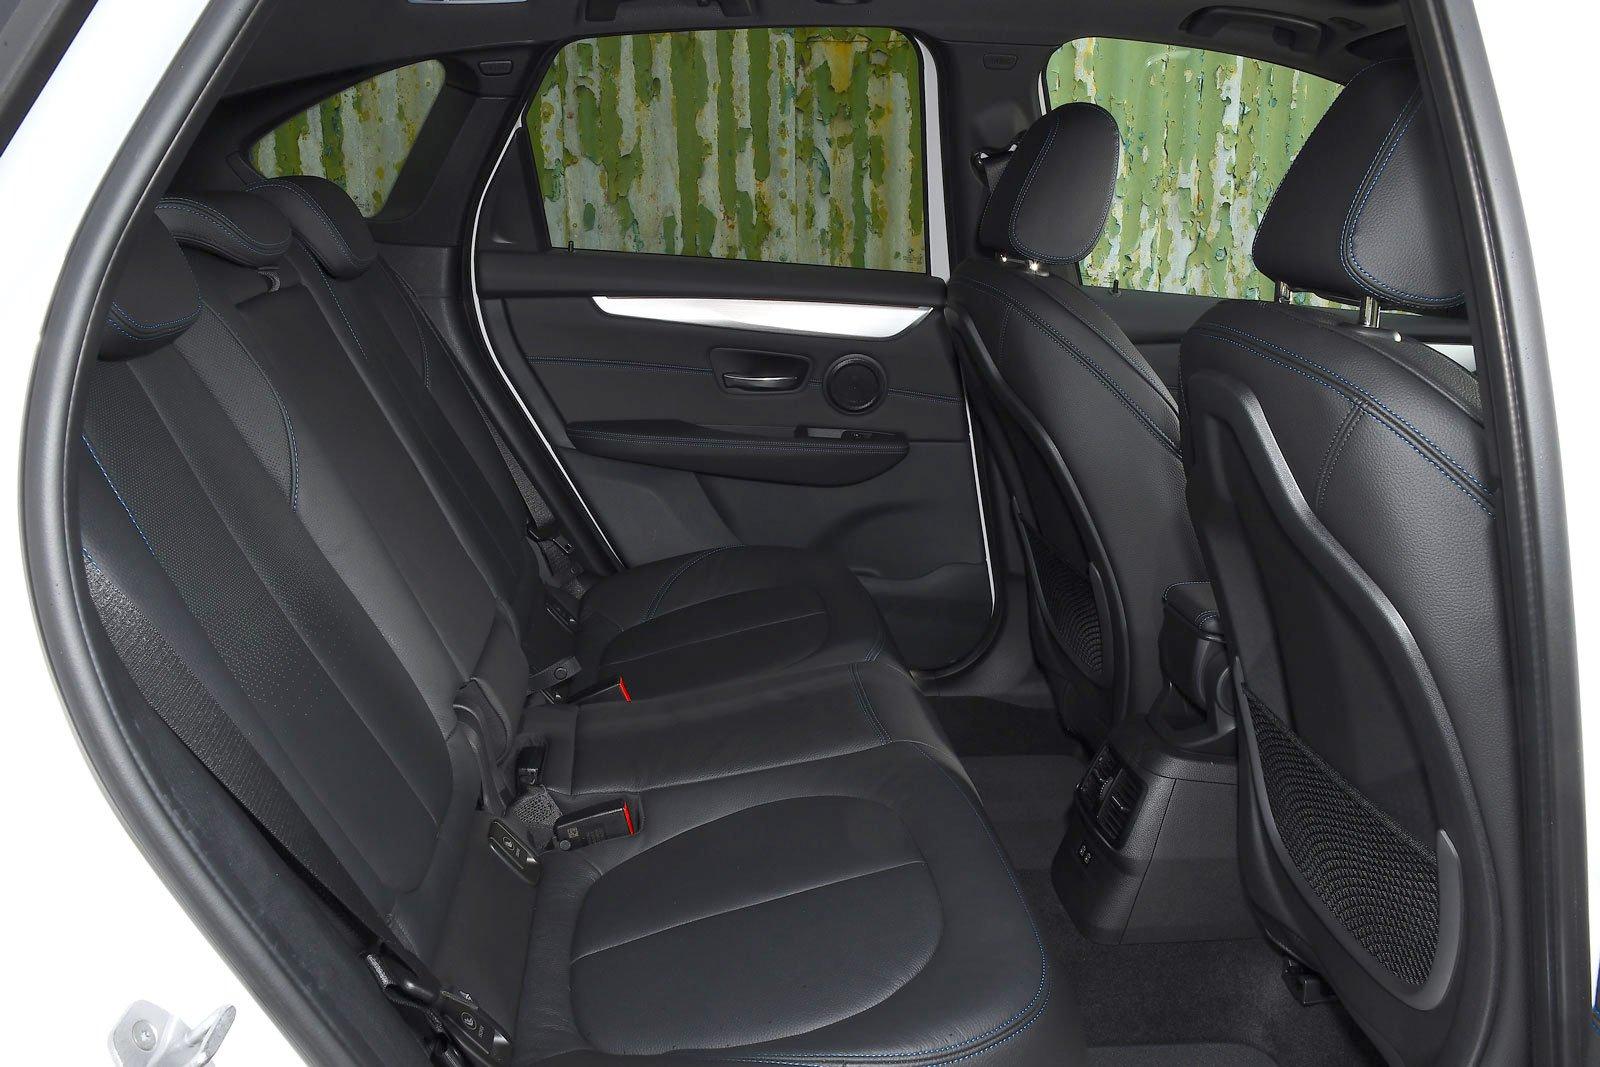 BMW 2 Series Active Tourer 2021 rear seats